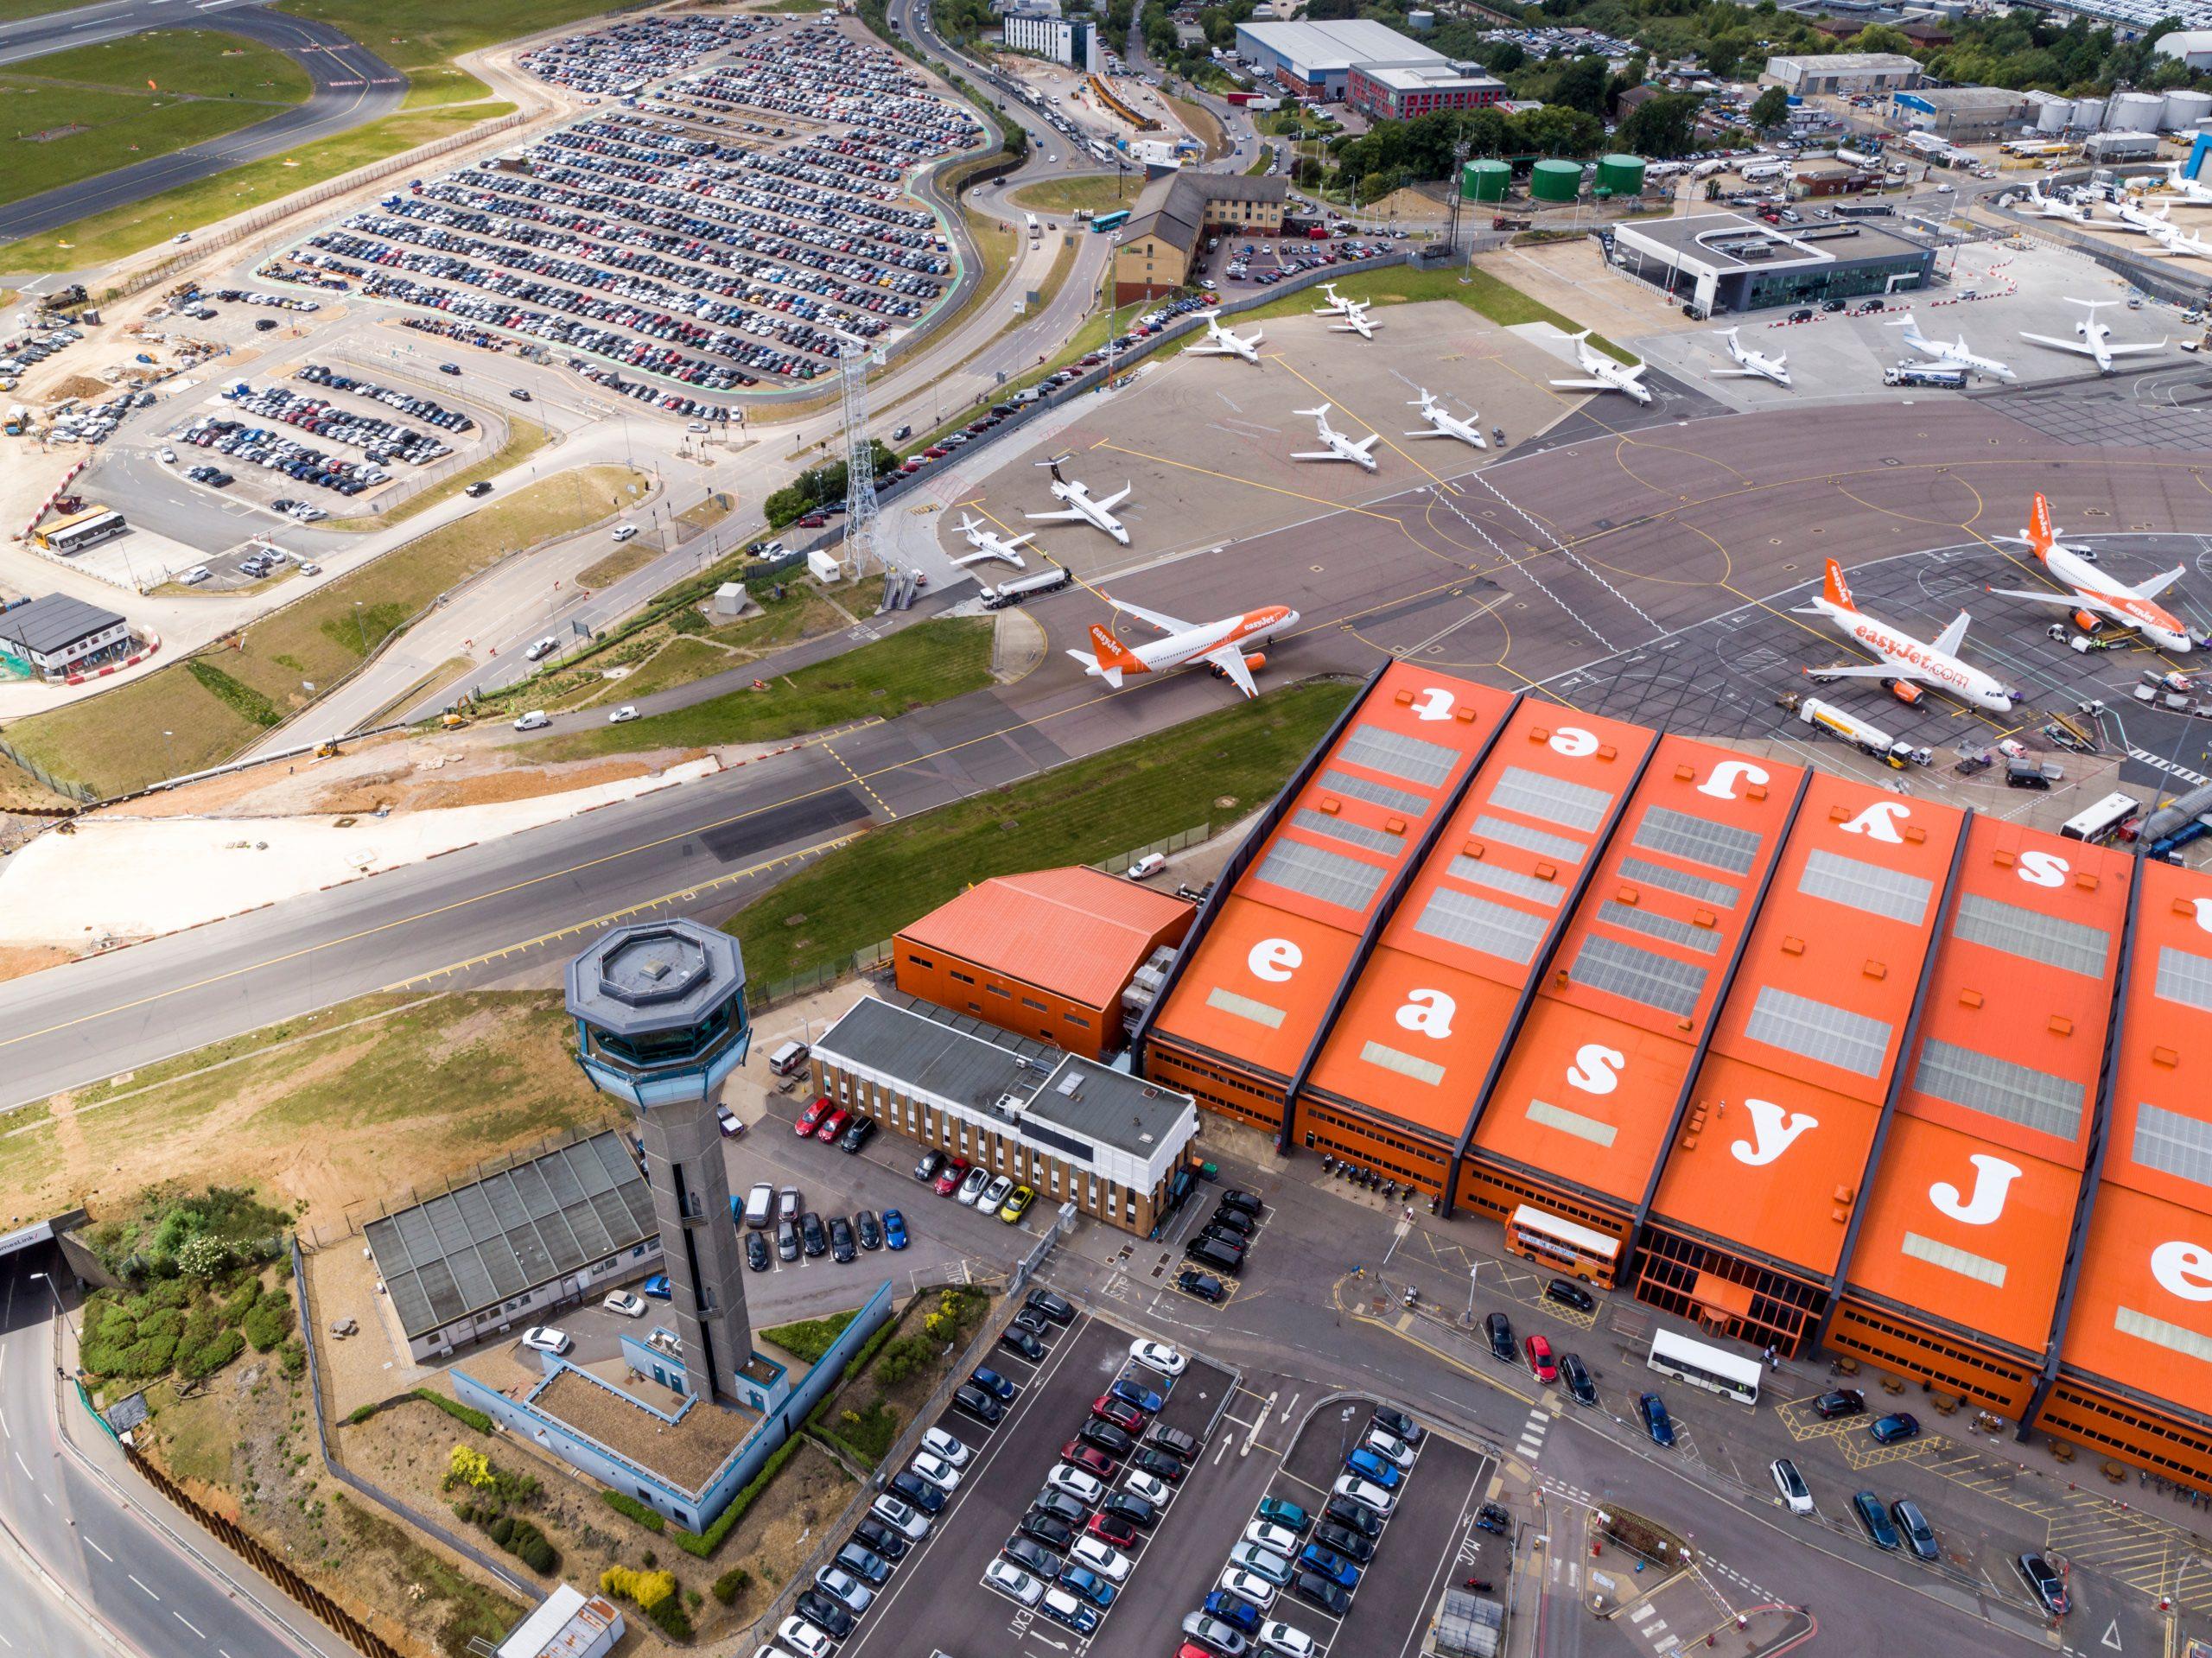 EasyJets hovedbase i London Luton Airport. (Captain_Kangaroo)